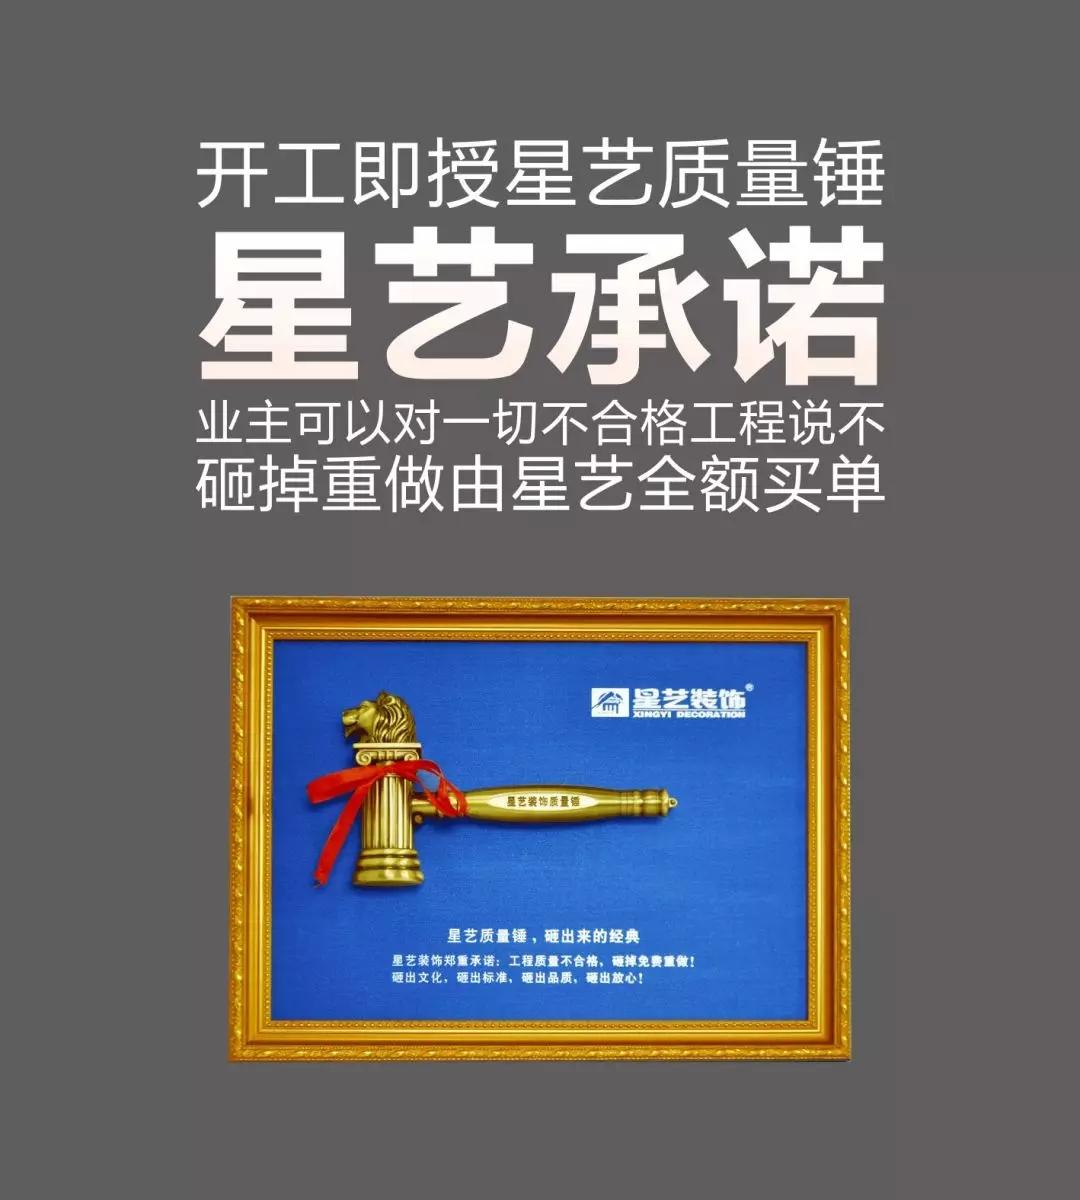 http://xystcdn.xydec.com.cn/uploadfiles/image/20181026/a4de5eff541f089cbd54a95d233aab13.jpg